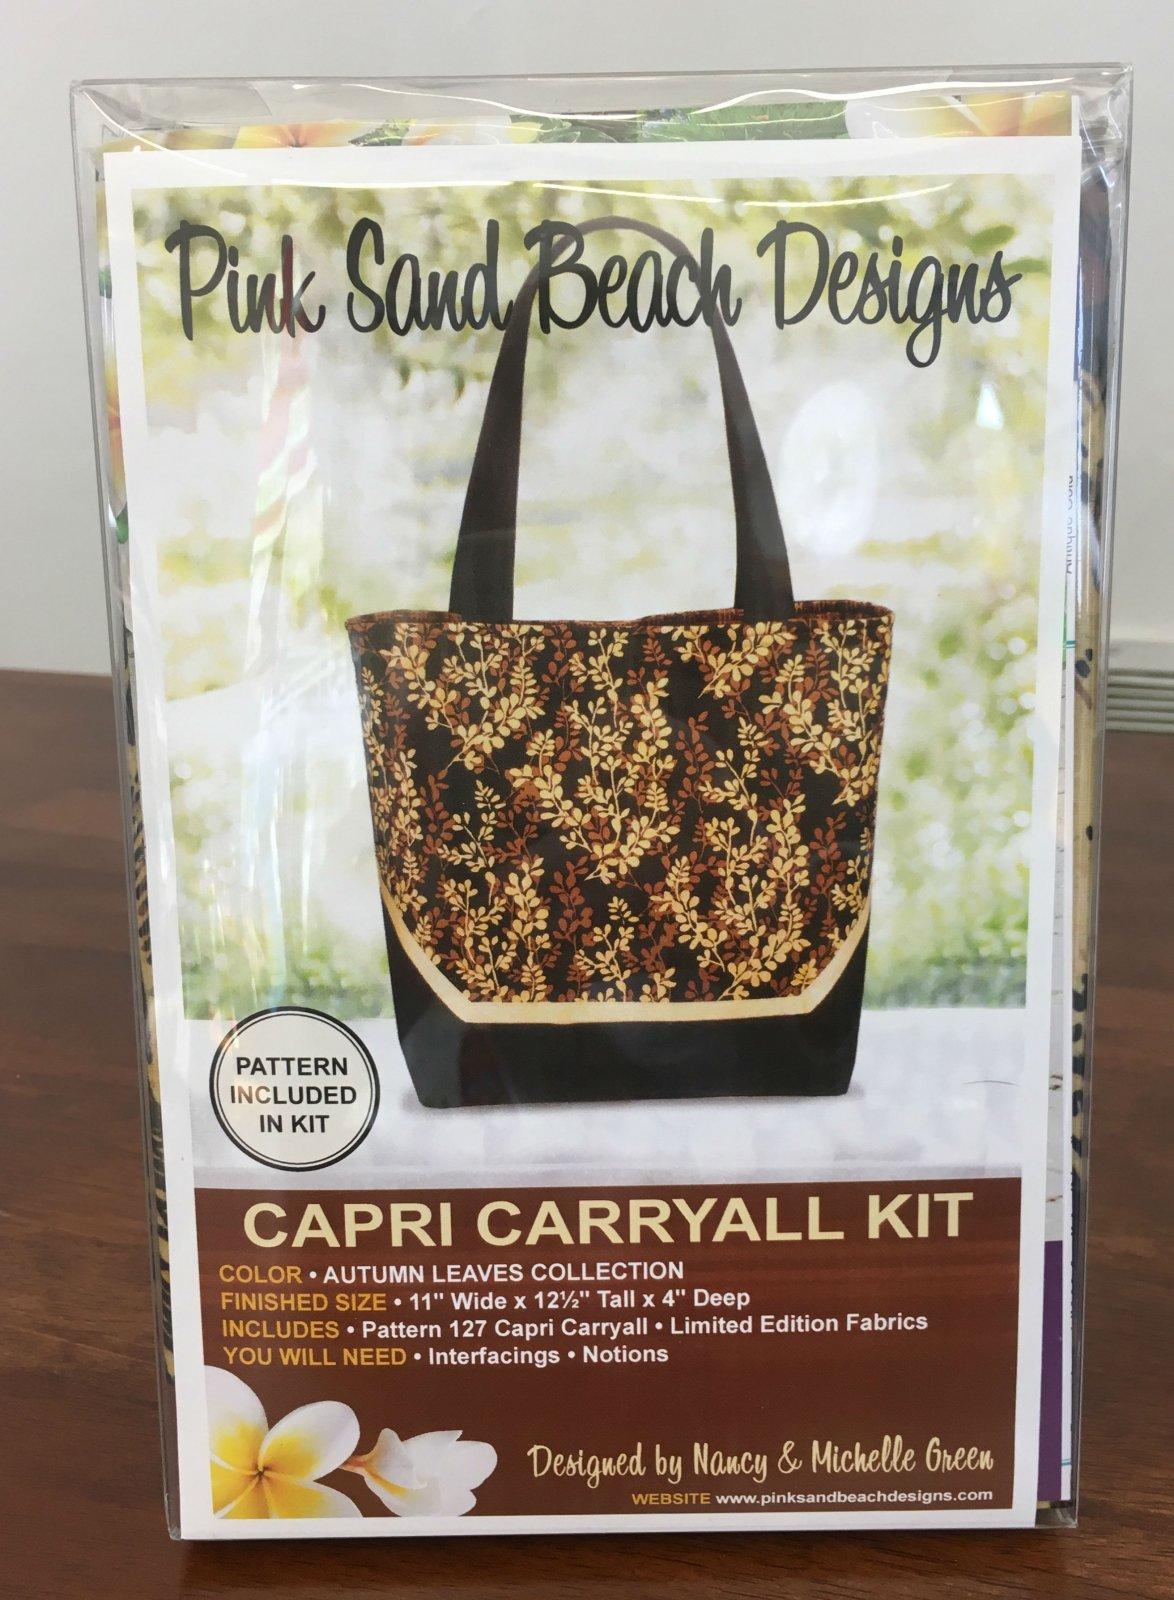 Capri Carryall Kit